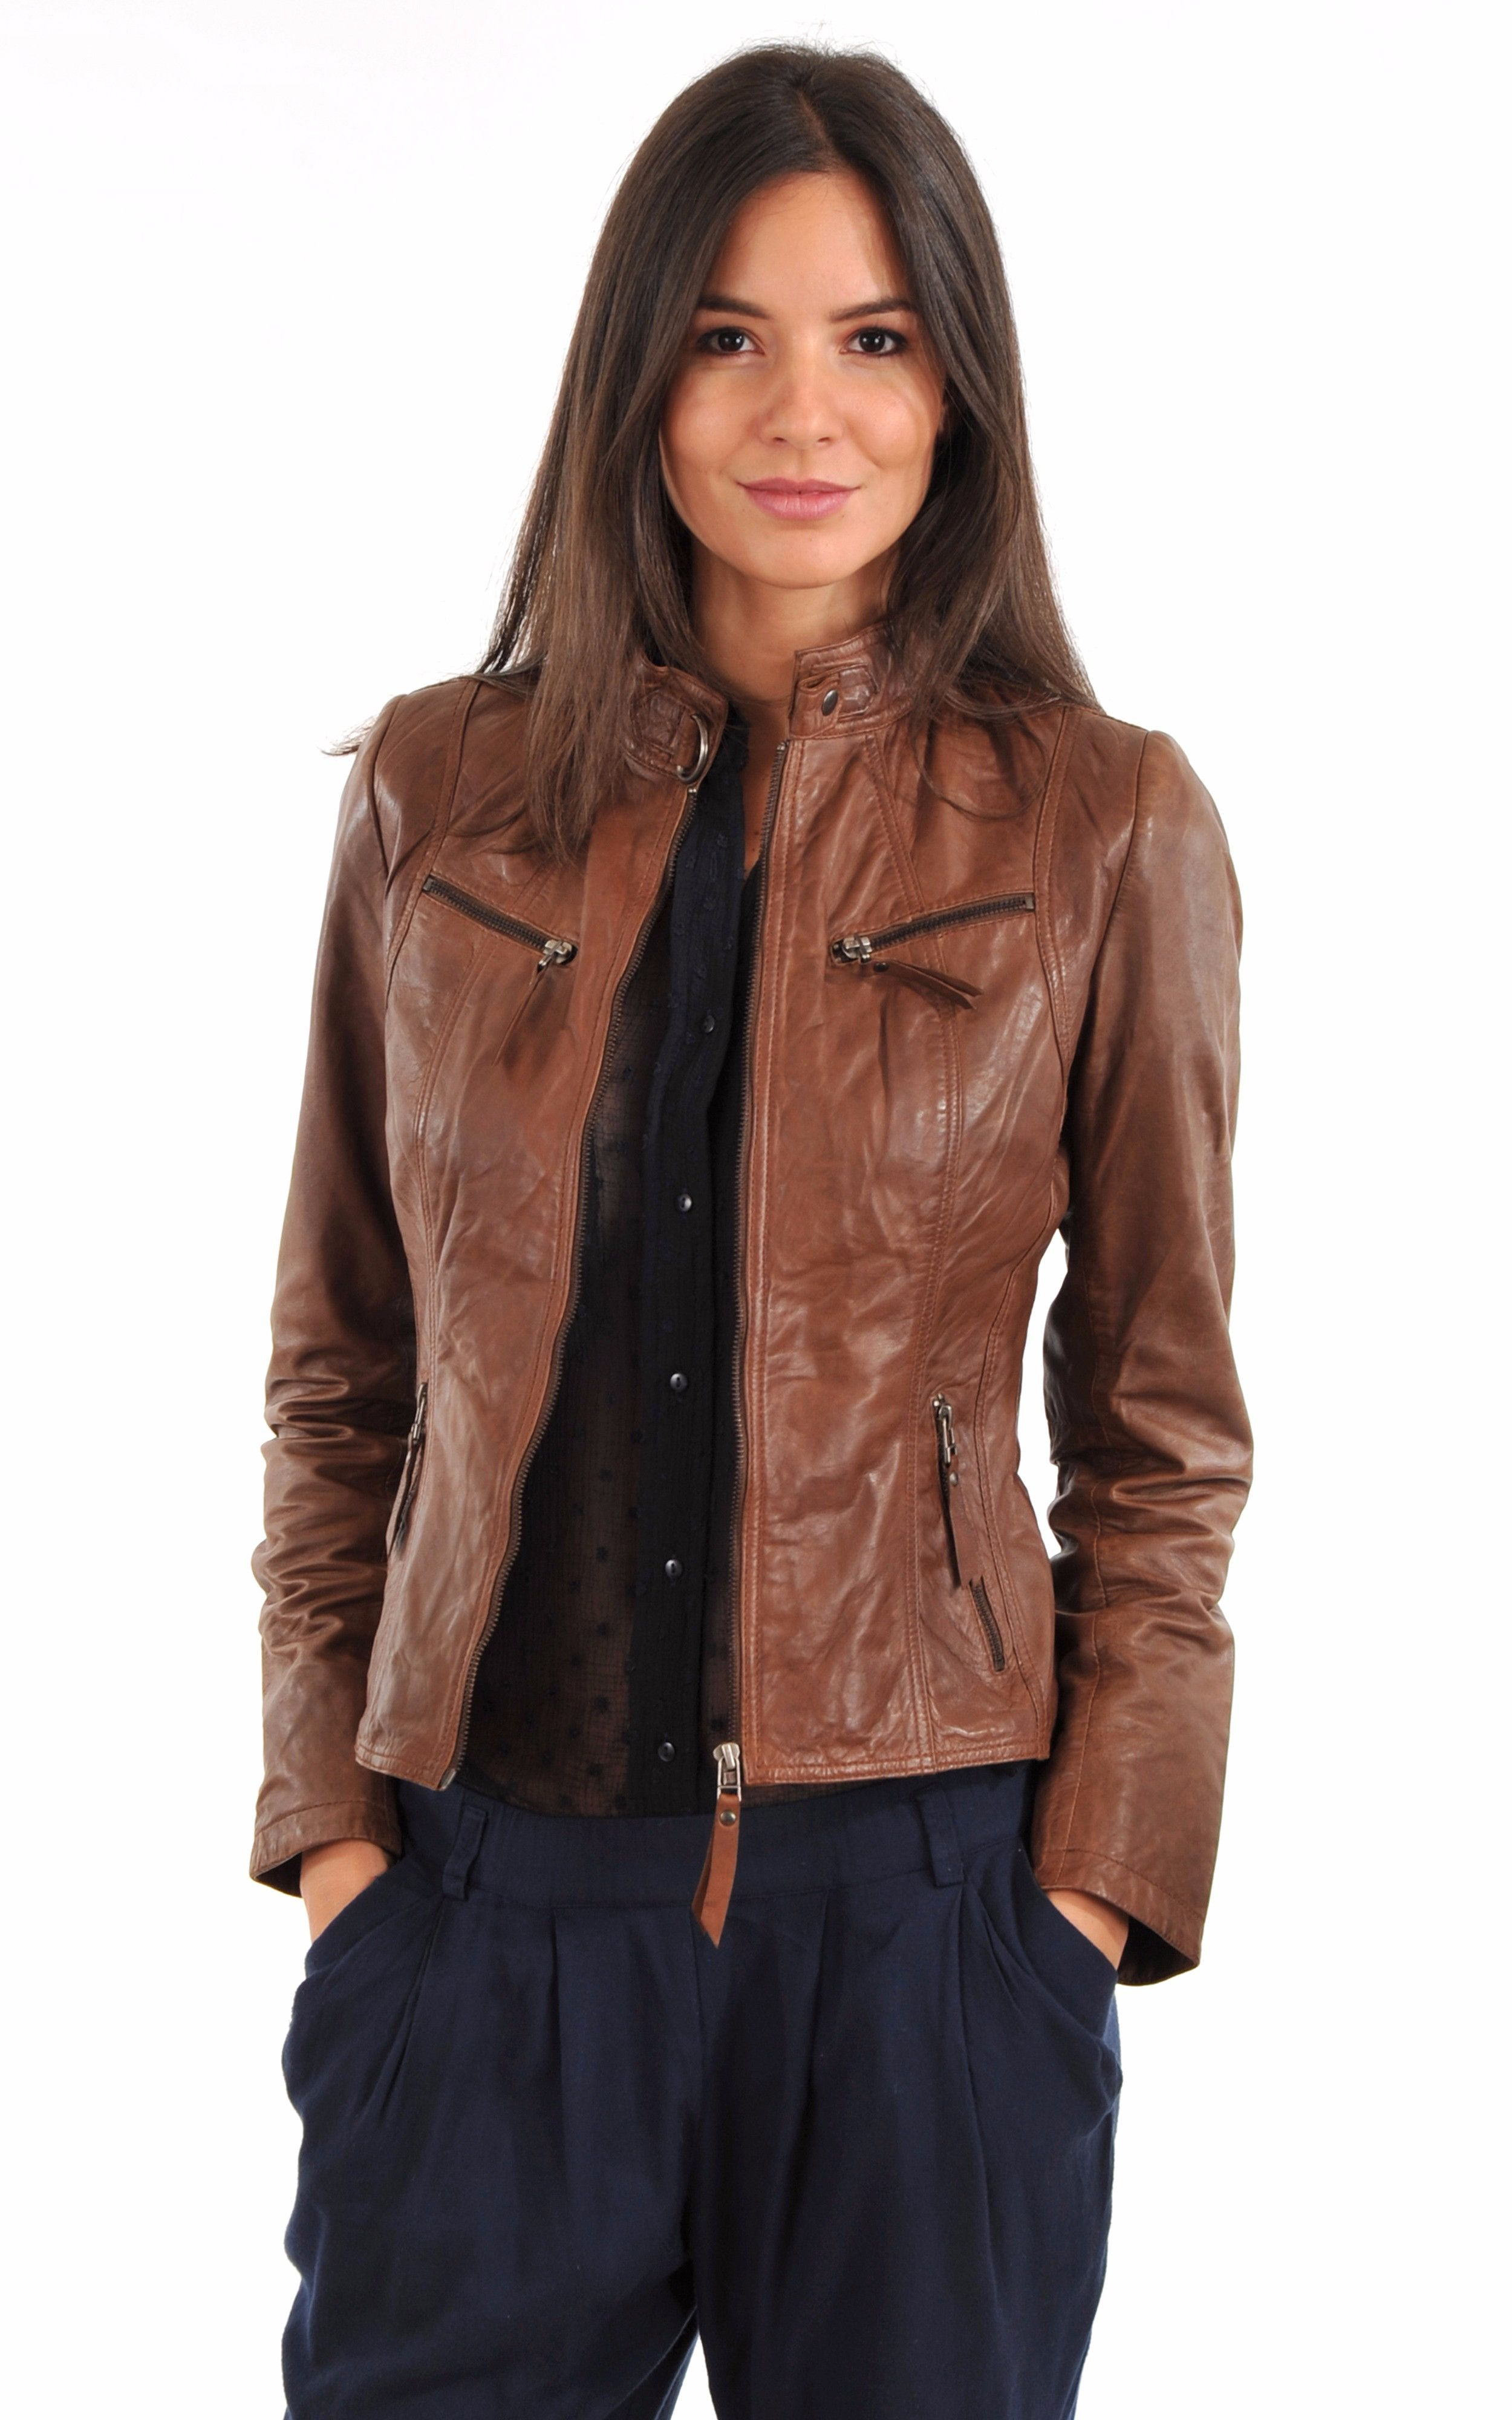 Recherche veste en cuir femme